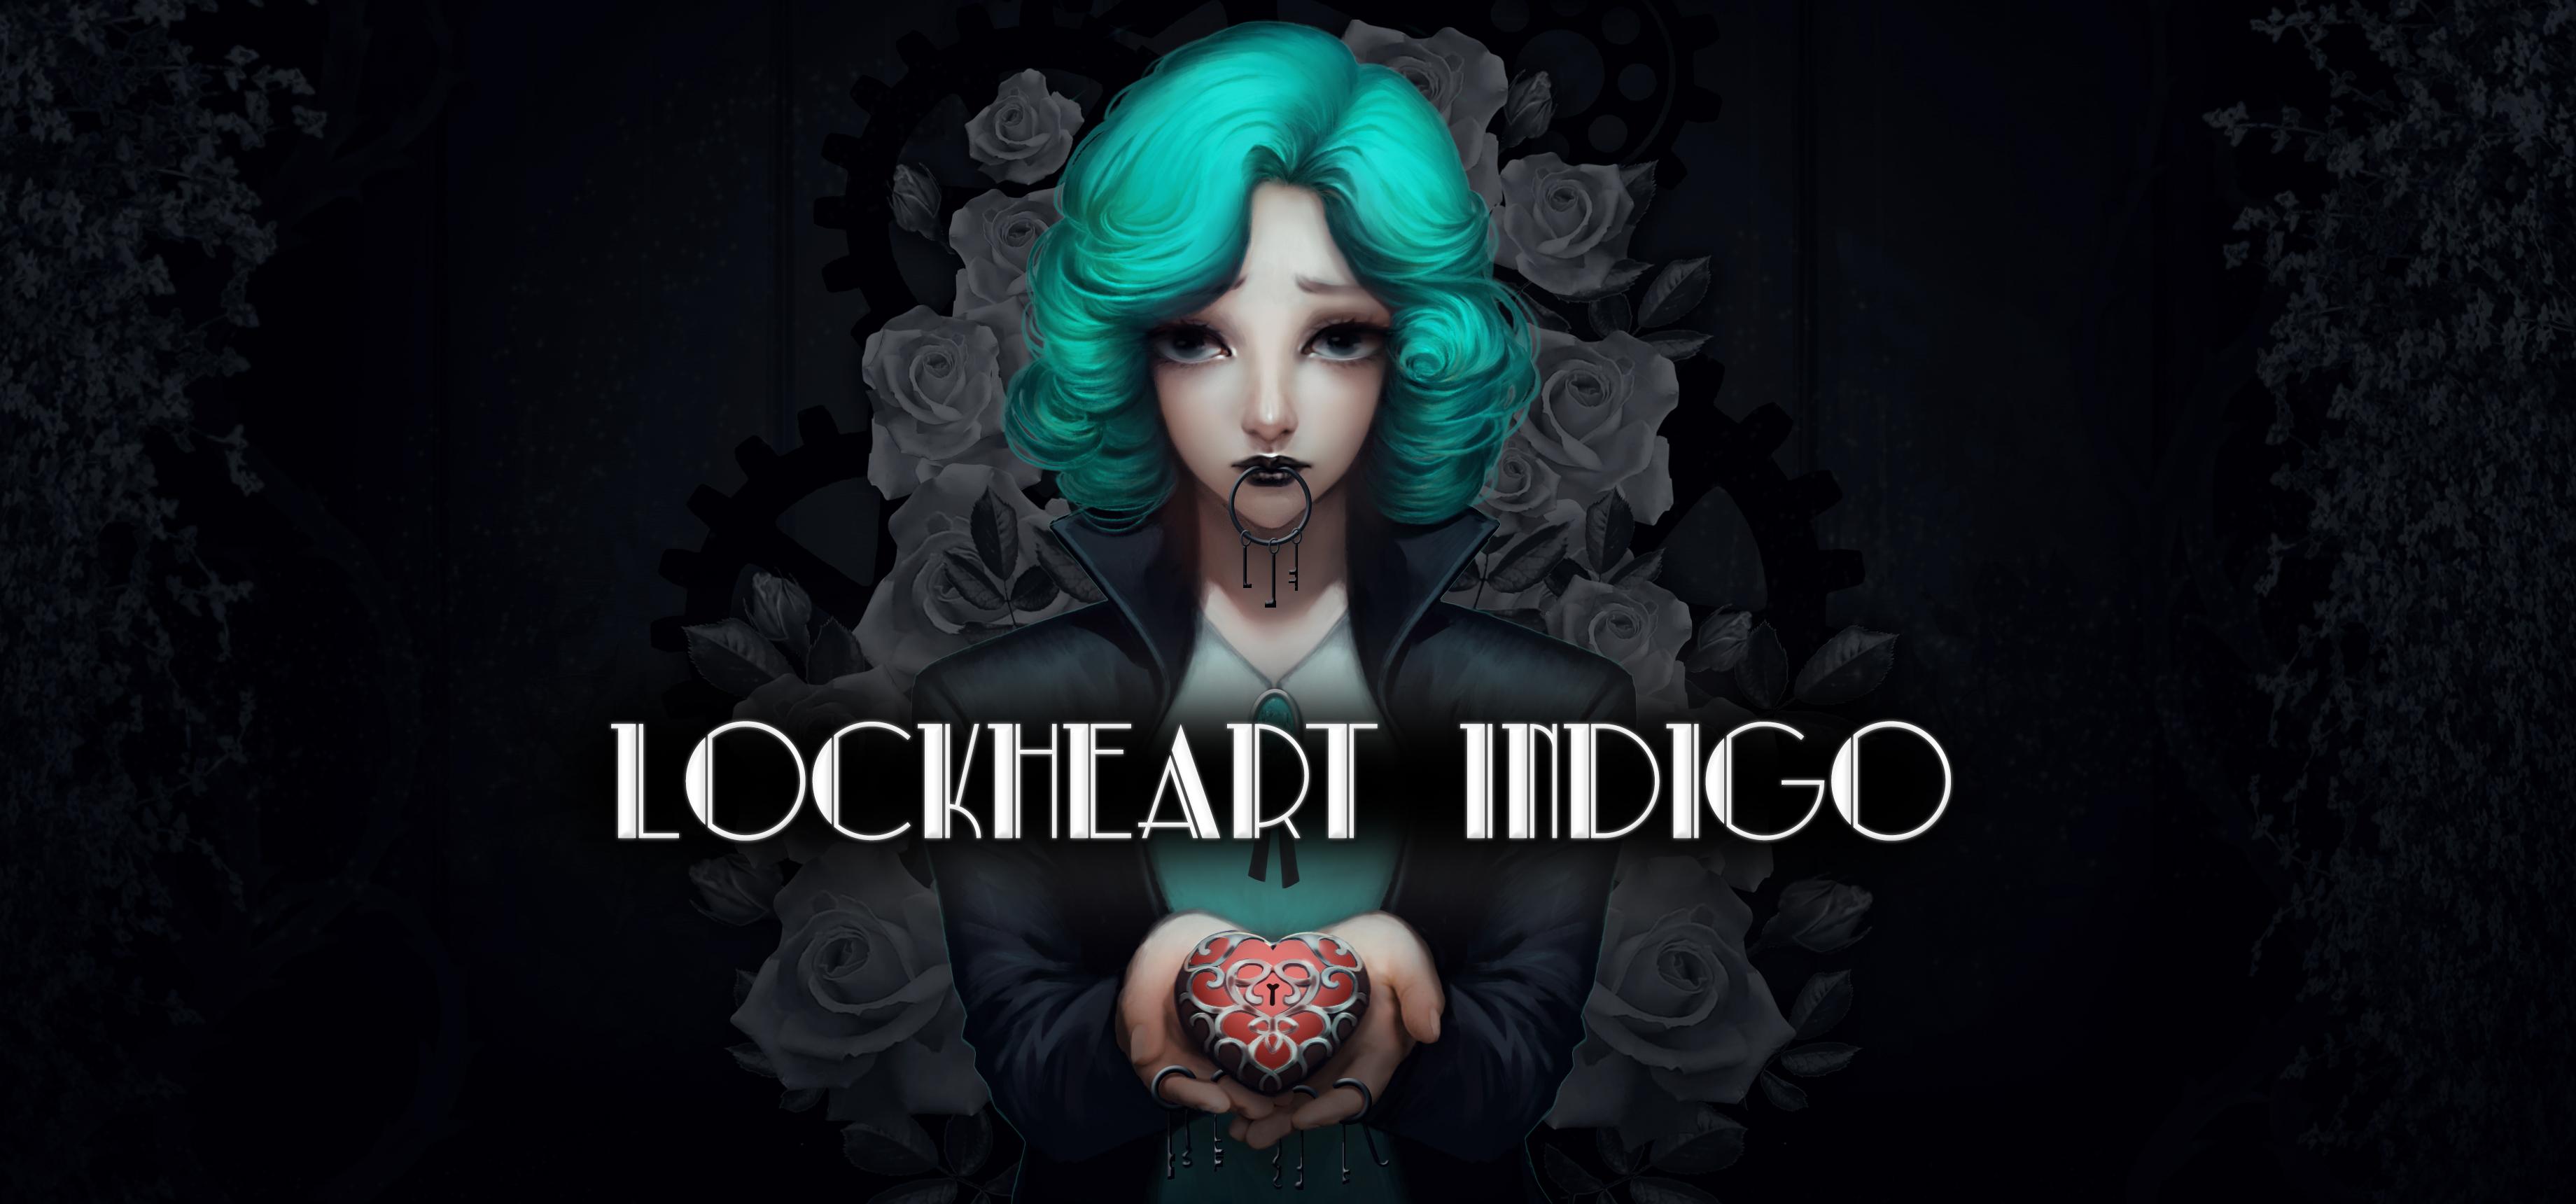 Lockheart Indigo